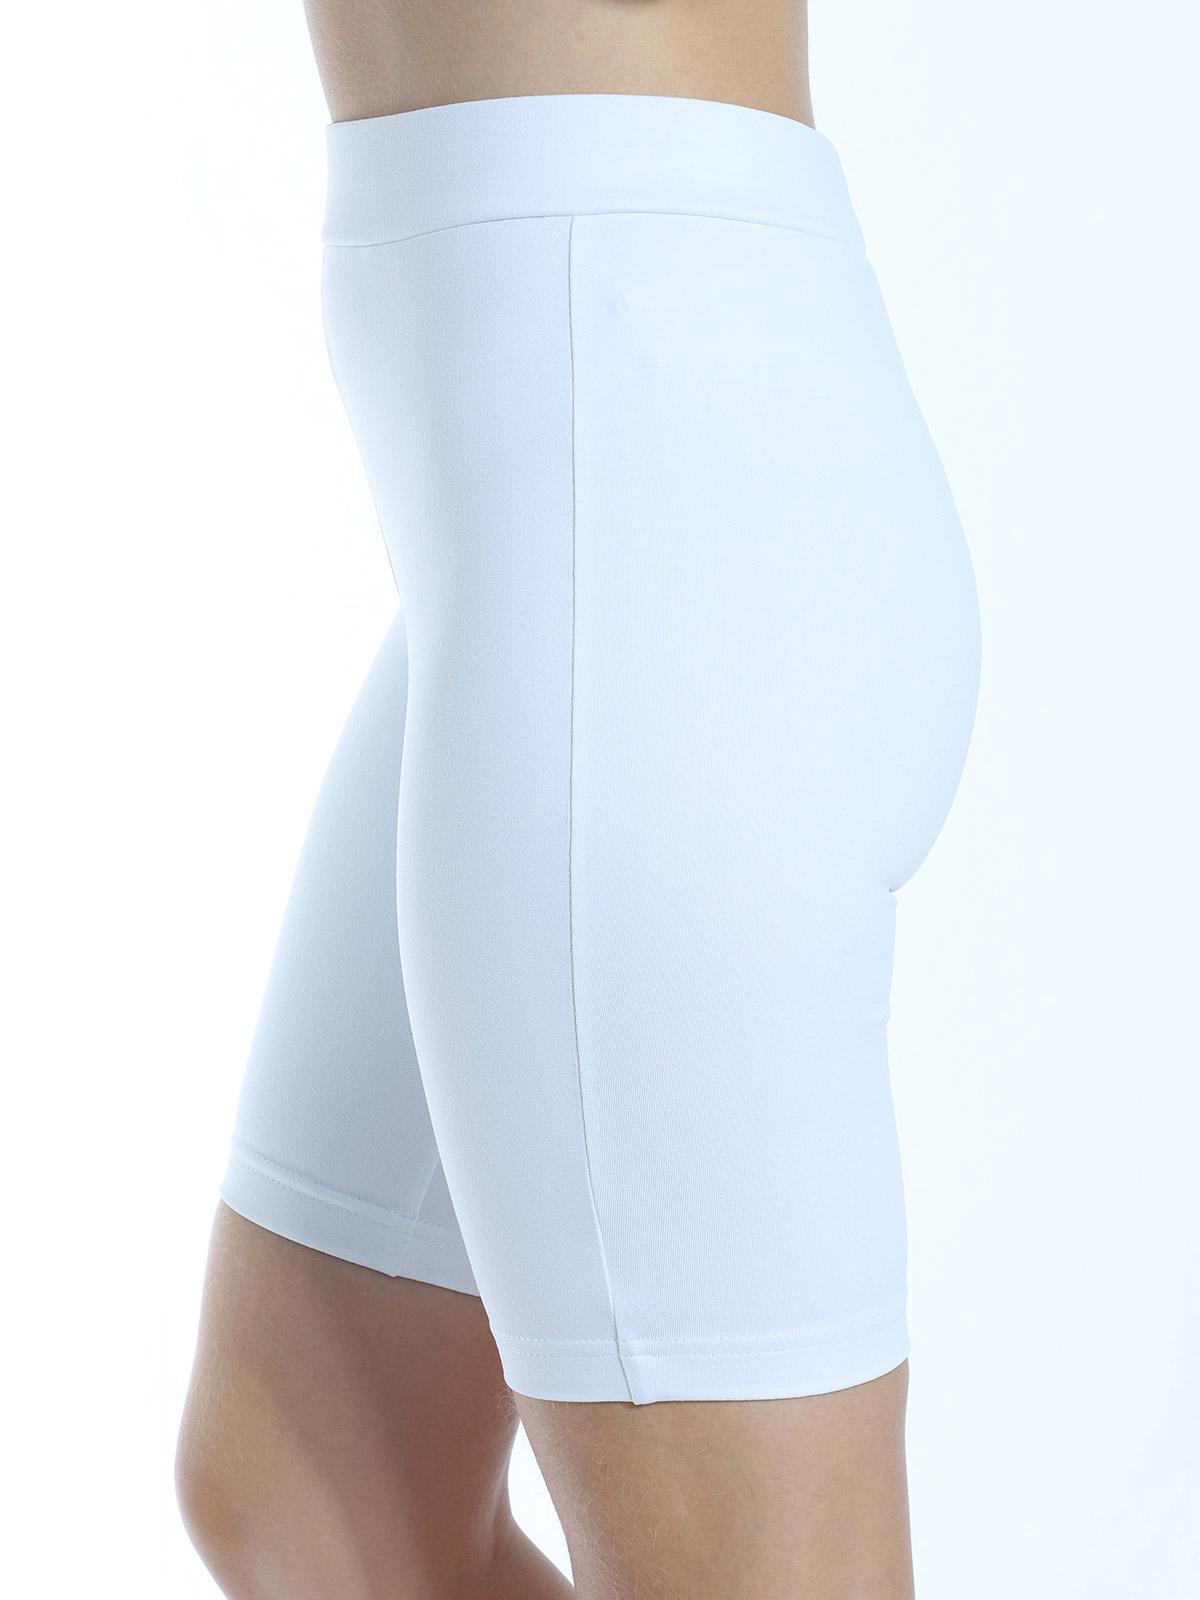 Bermuda Ciclista Feminina Fitness Academia Branco